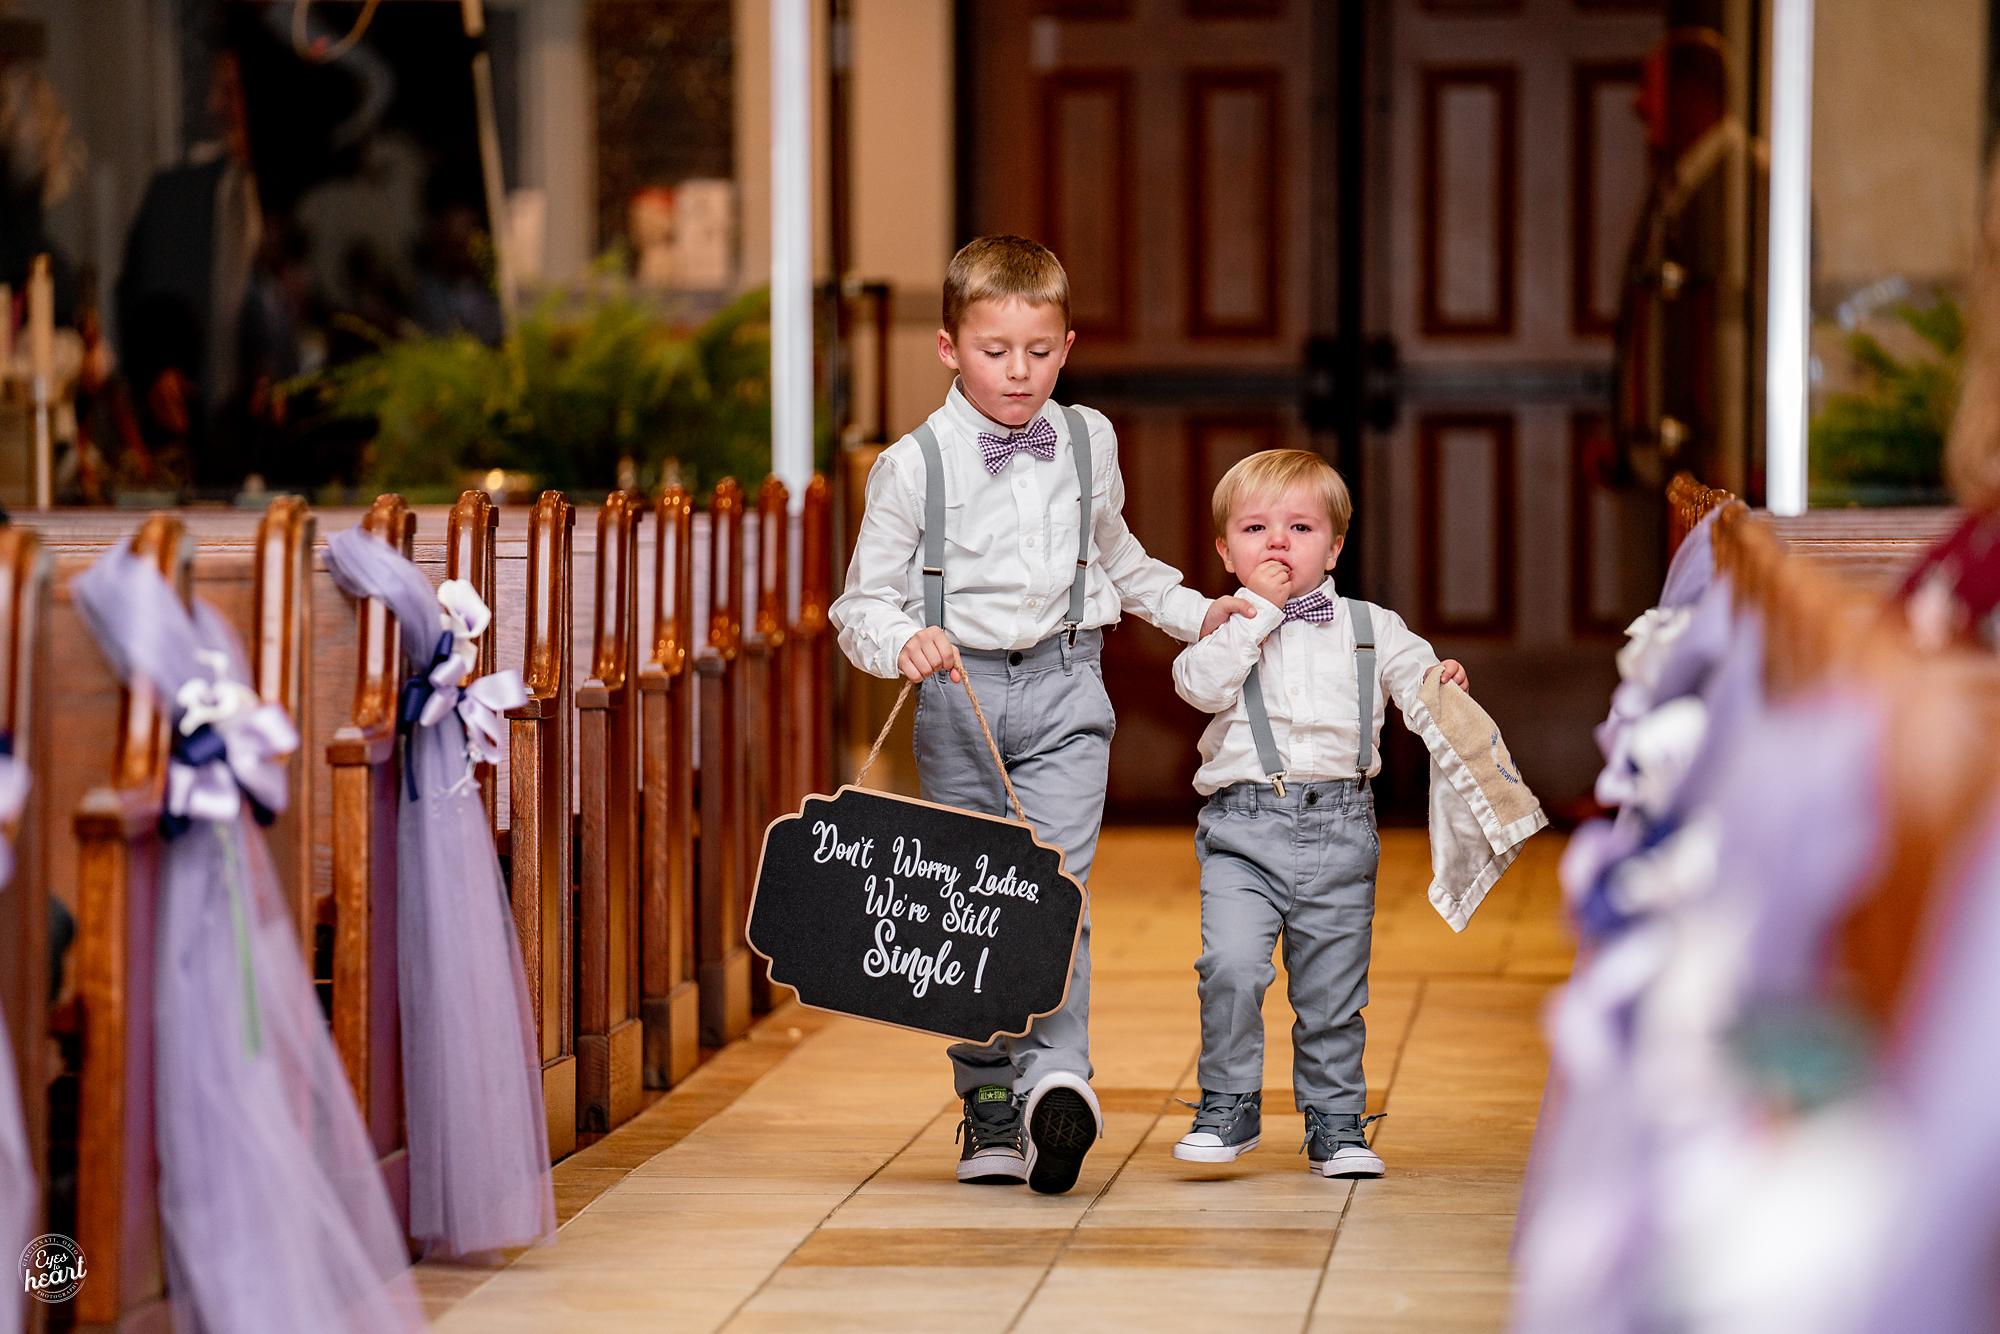 St-Henry-Catholic-Church-Erlanger-KY-Wedding-Photography-1.jpg